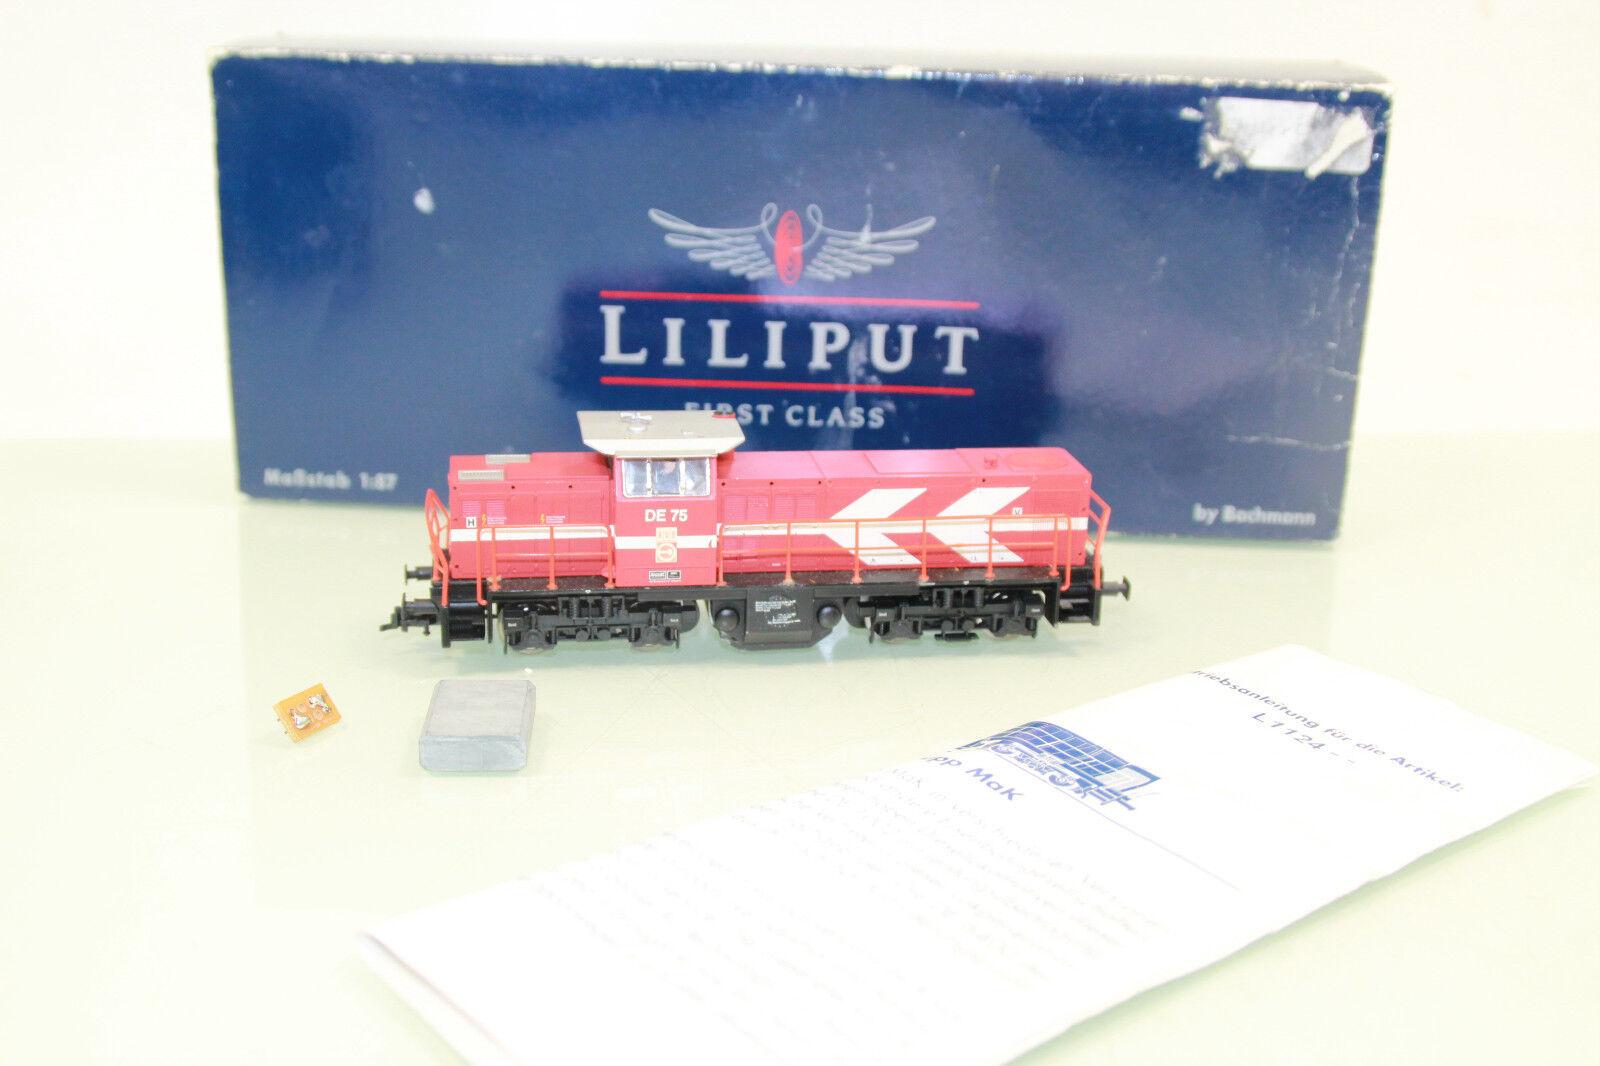 compras online de deportes Liliput pista h0 l112401 diesellok Mak el KVB KVB KVB colonia digital en embalaje original (nl2509)  venta al por mayor barato